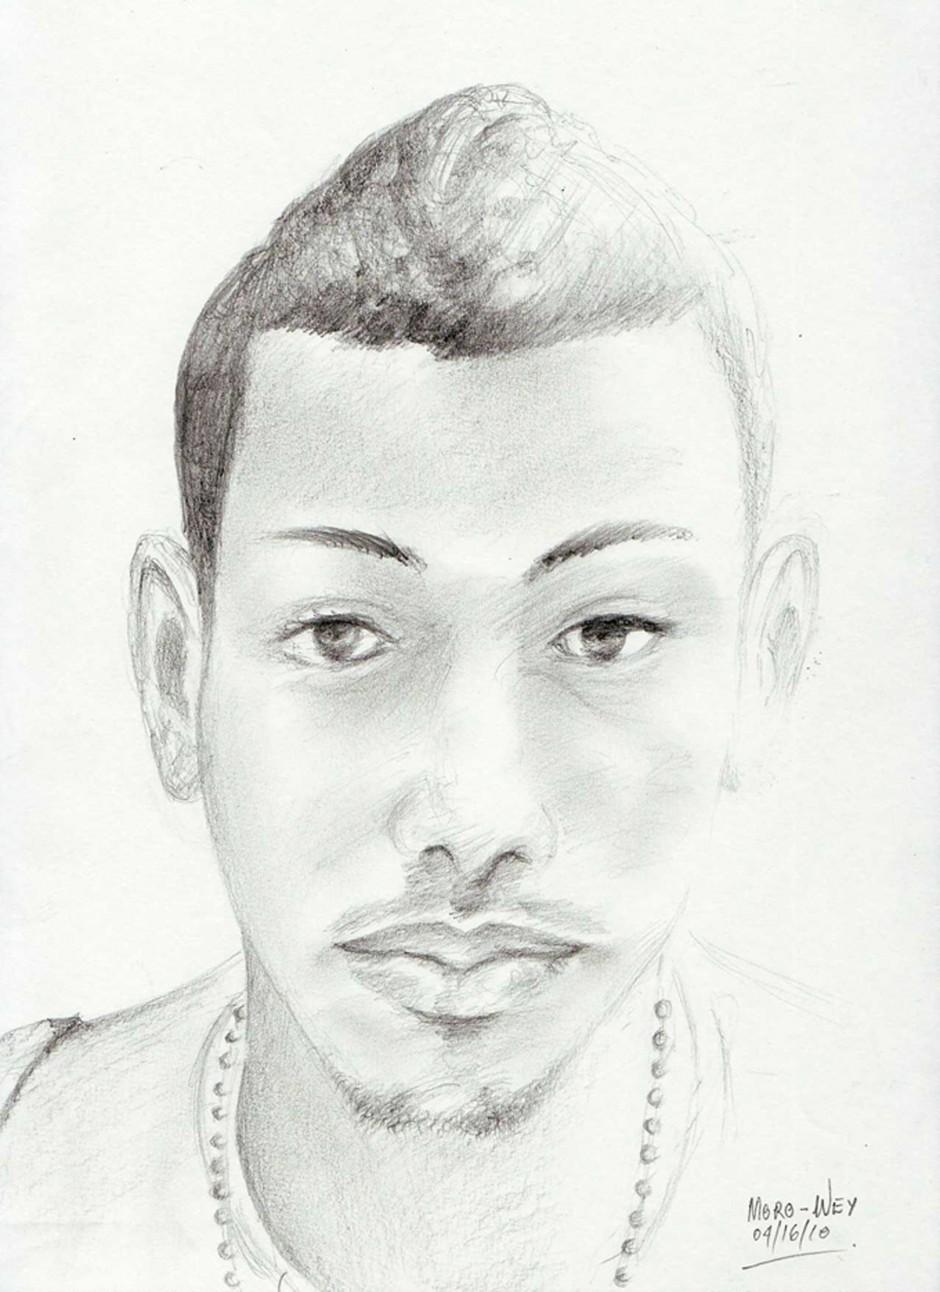 portraits_drawings_64